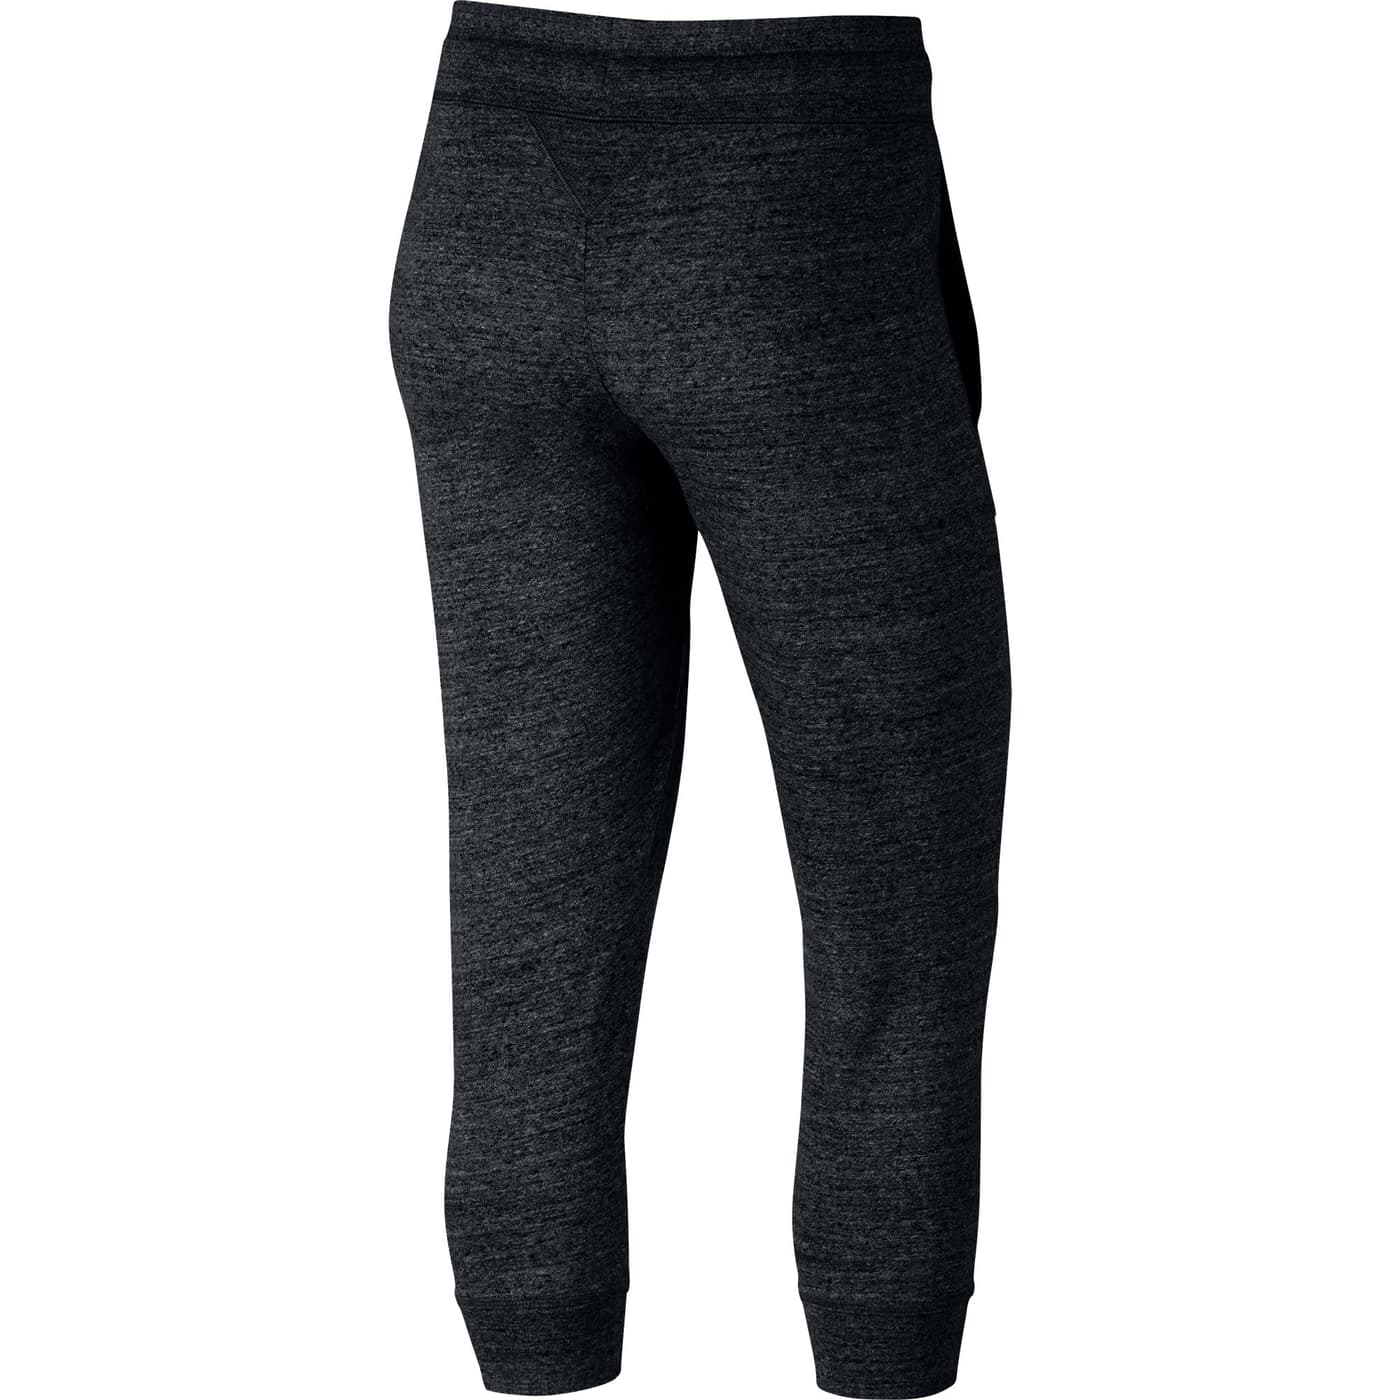 pantalon femme vintage nike